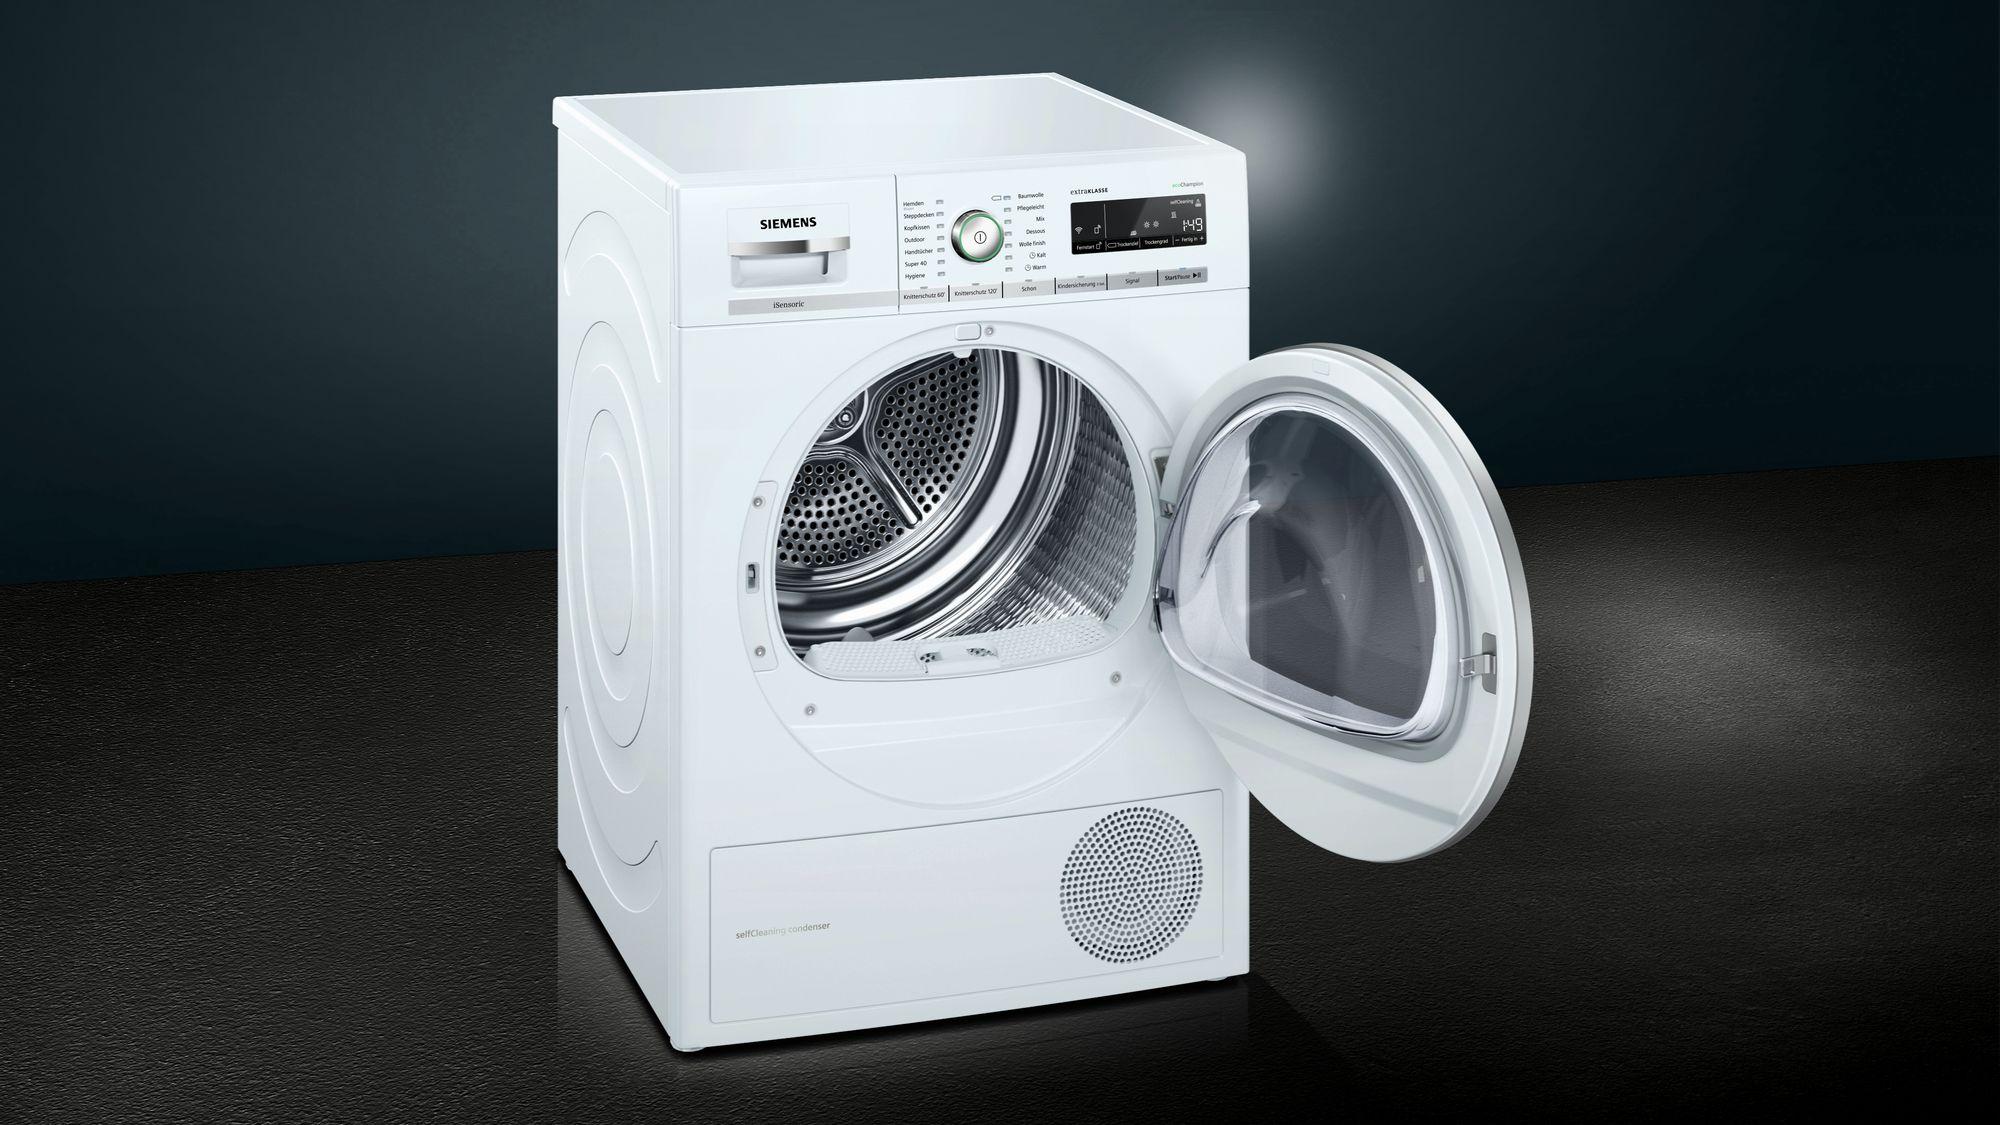 Trockner Siemens Iq700 : Siemens iq wärmepumpentrockner isensoric wt wh psi